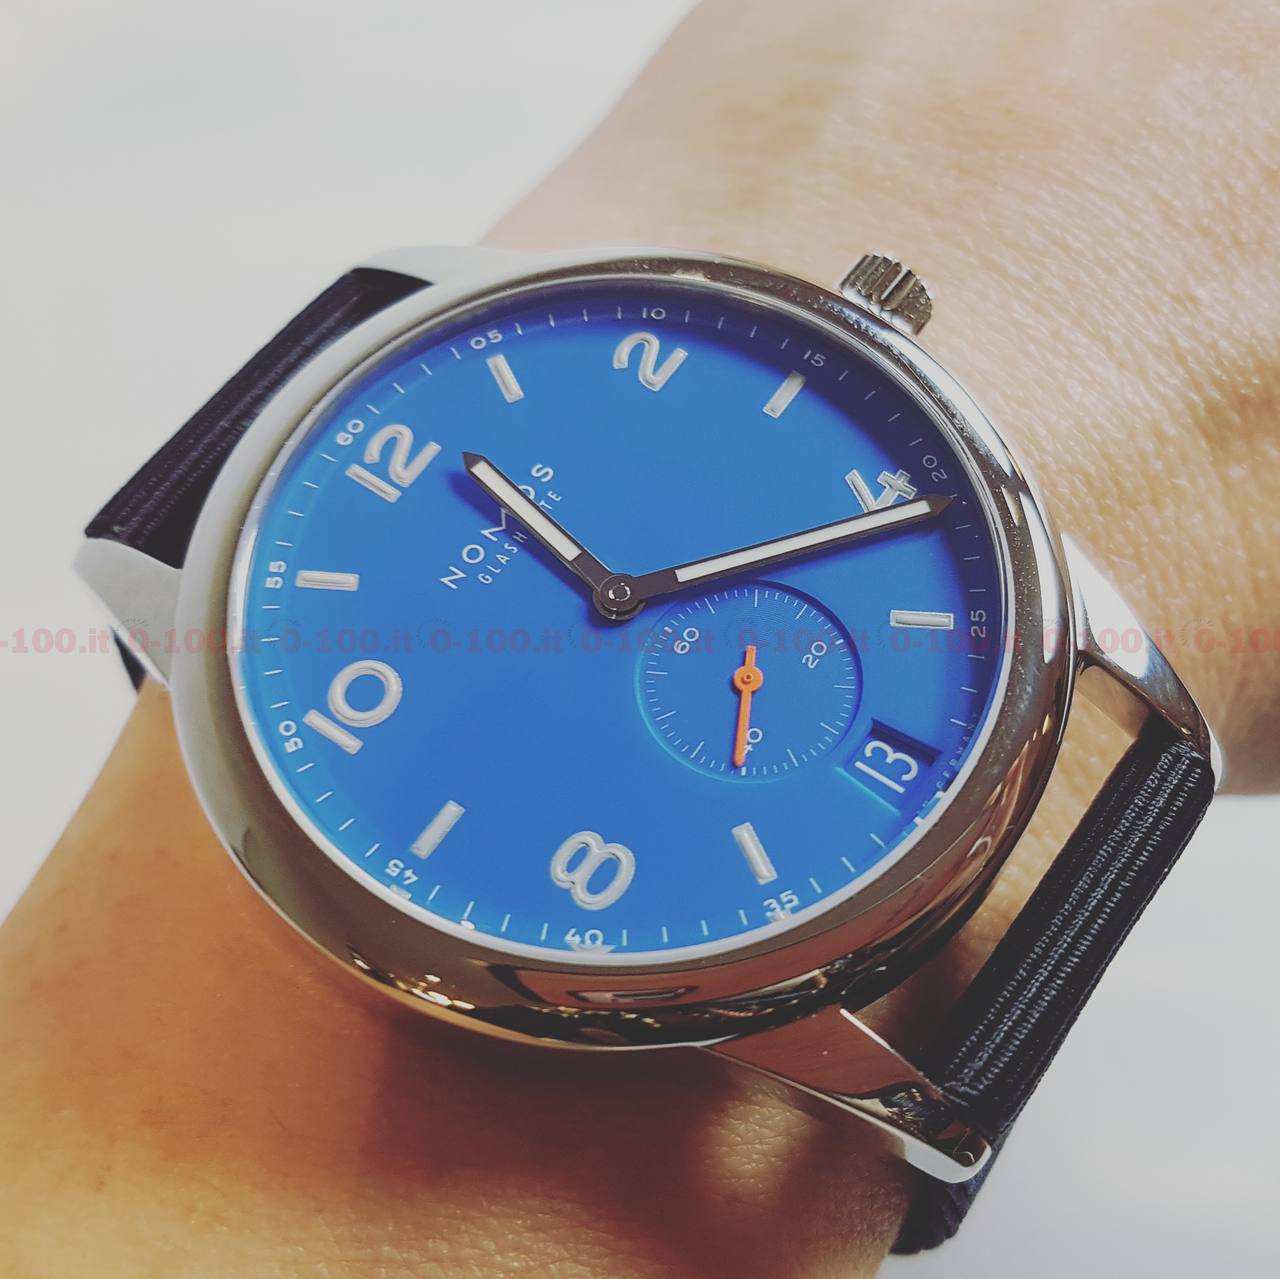 baselworld-2017-nomos-glashutte-Ref_554_ Ahoi Datum signalblau- -prezzo-price_0-100